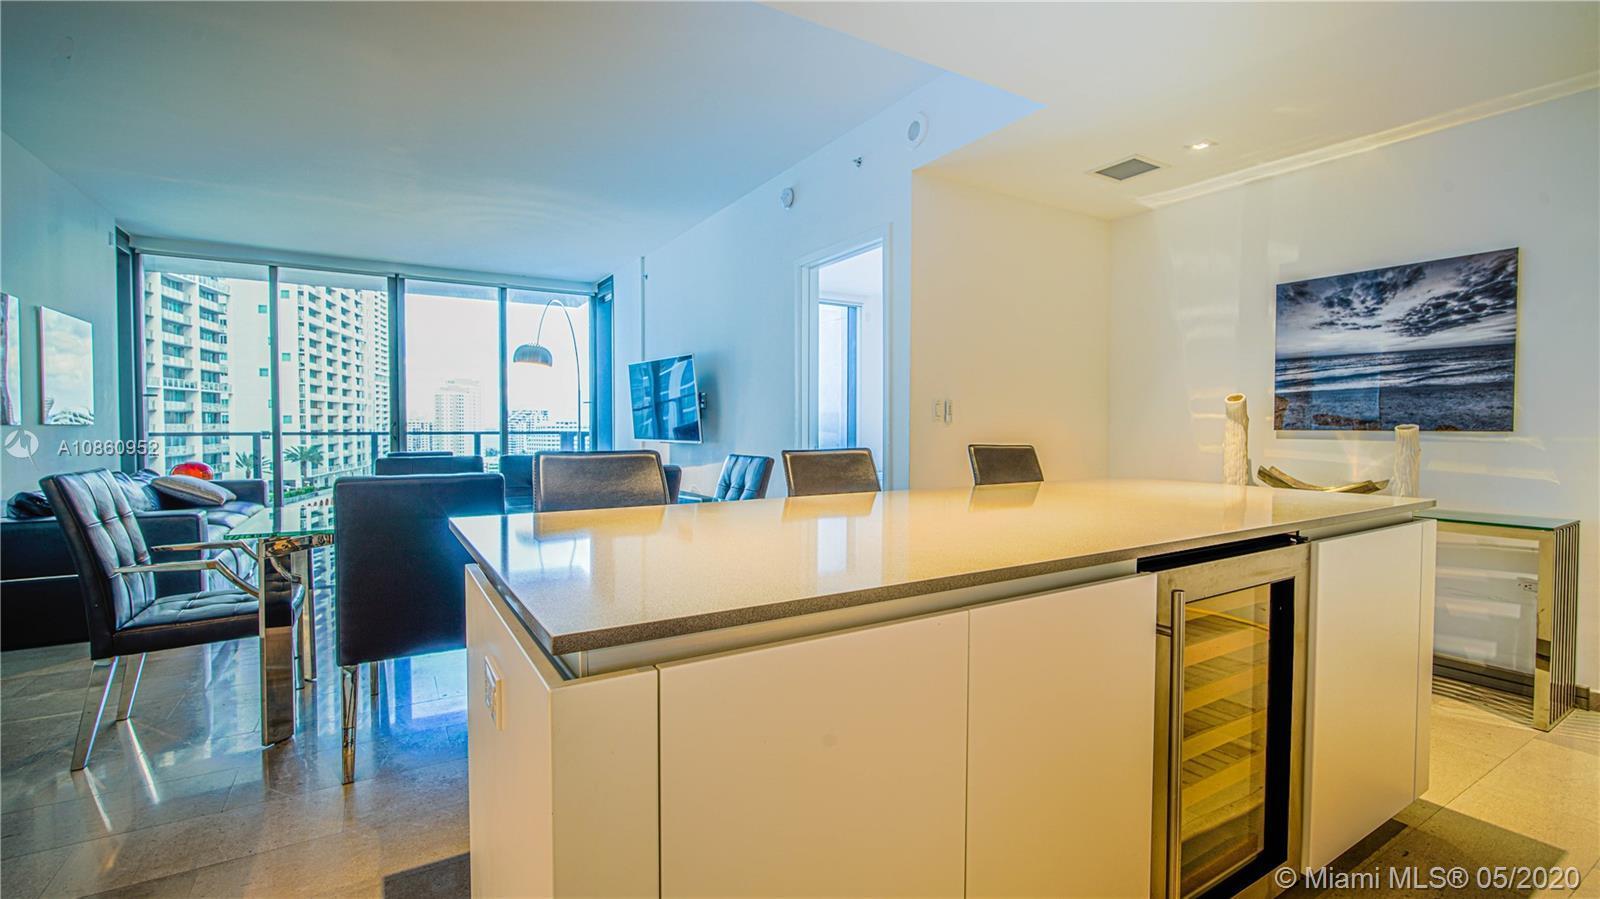 Beautiful 2 Bedroom 2.5 Baths unit at the luxury Reach, Brickell City Center. Modern italian kitchen